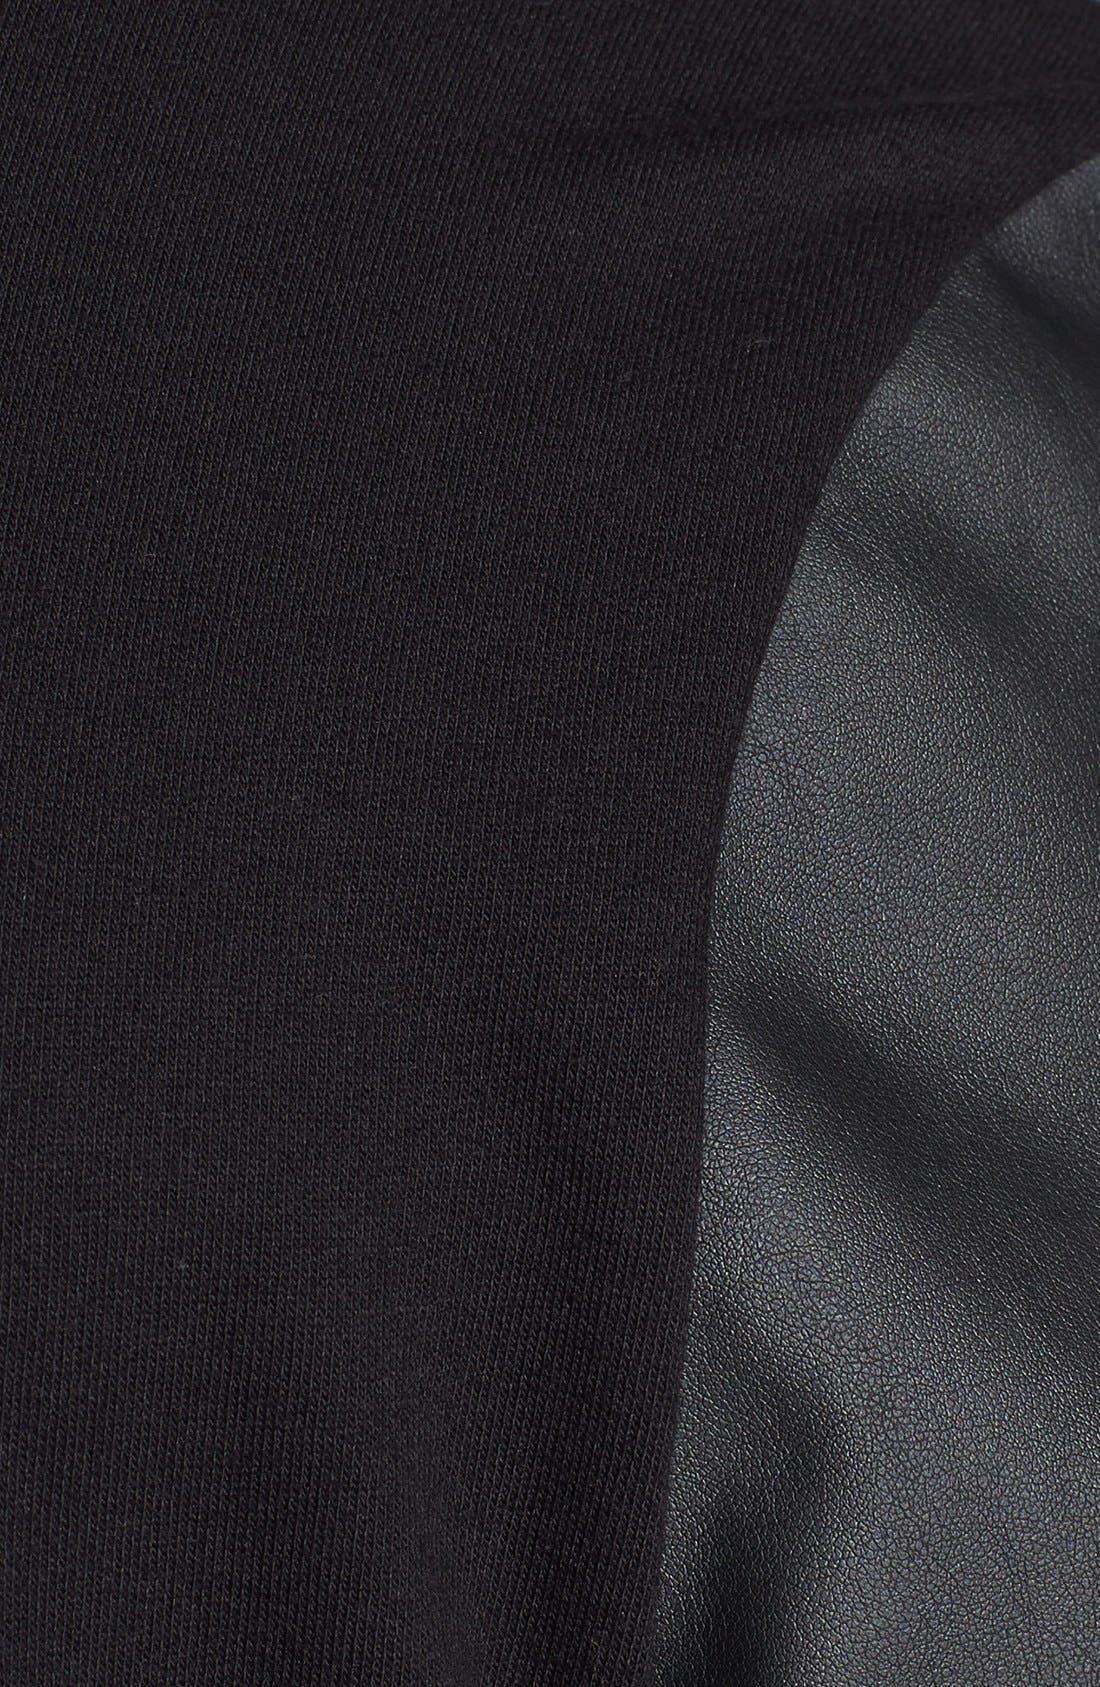 Alternate Image 3  - Topman Faux Leather Sleeve Crewneck Sweatshirt